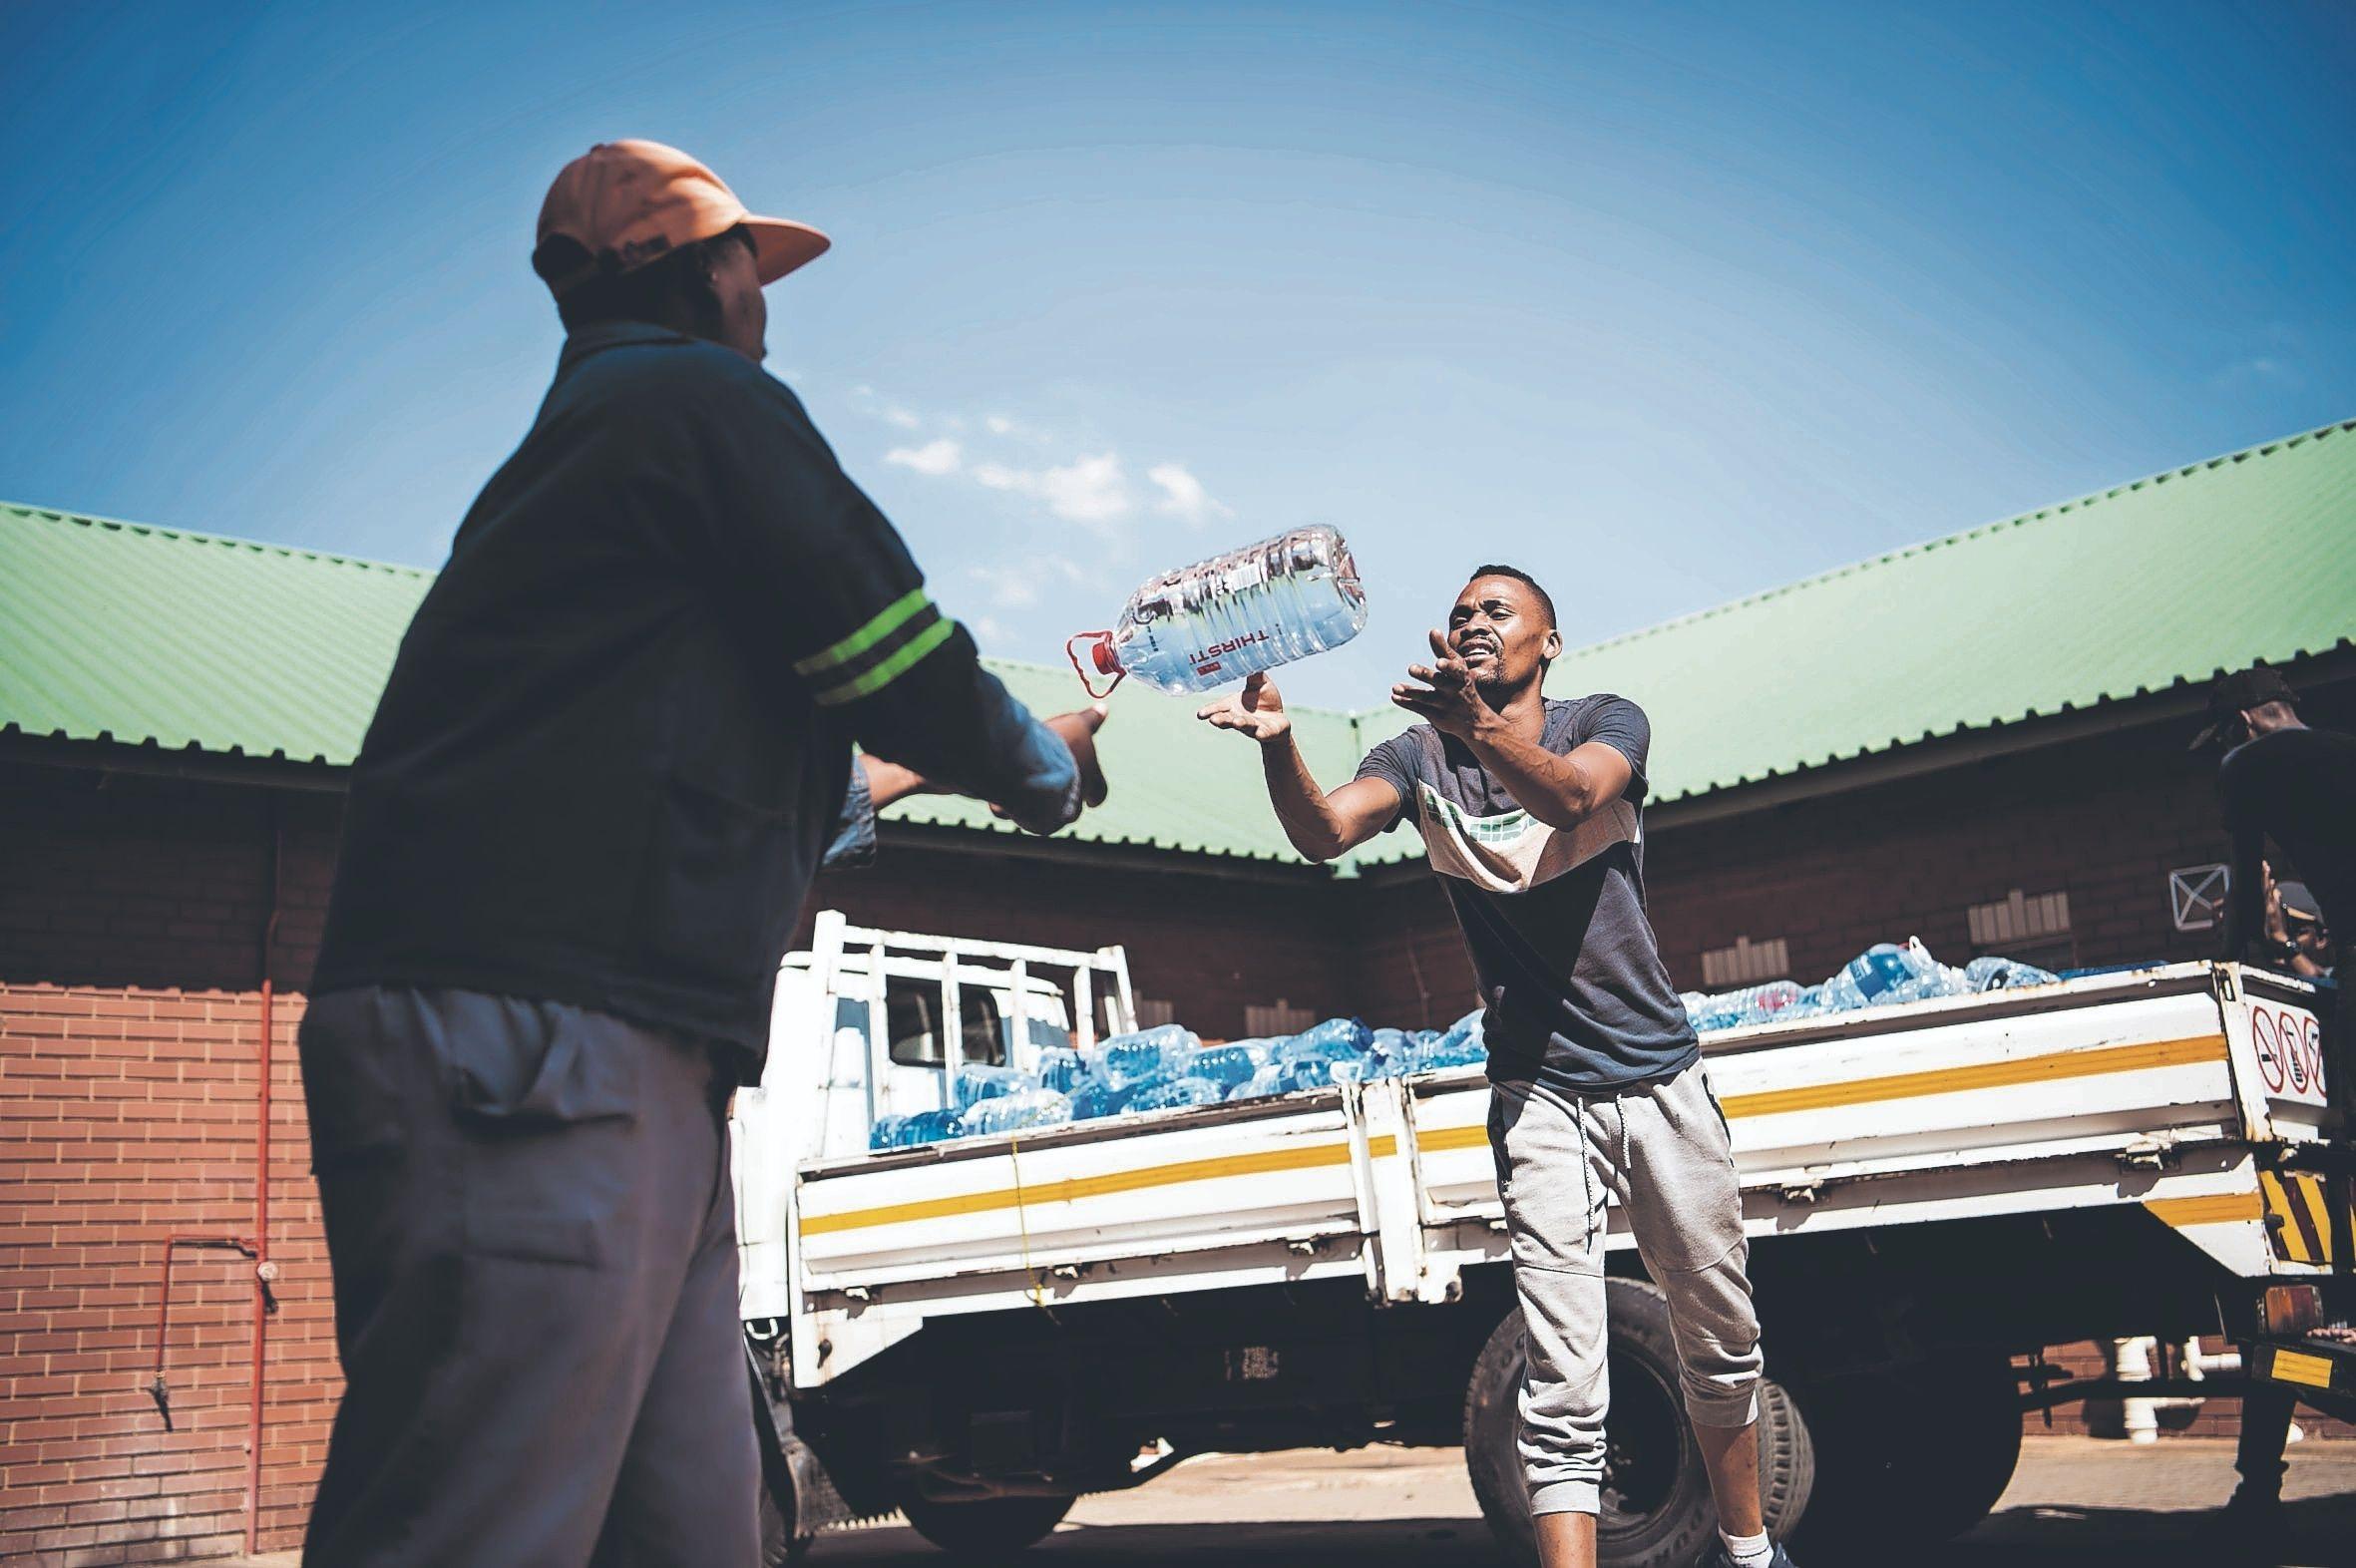 Water Delivery in Hammanskraal (Delwyn Verasamy)